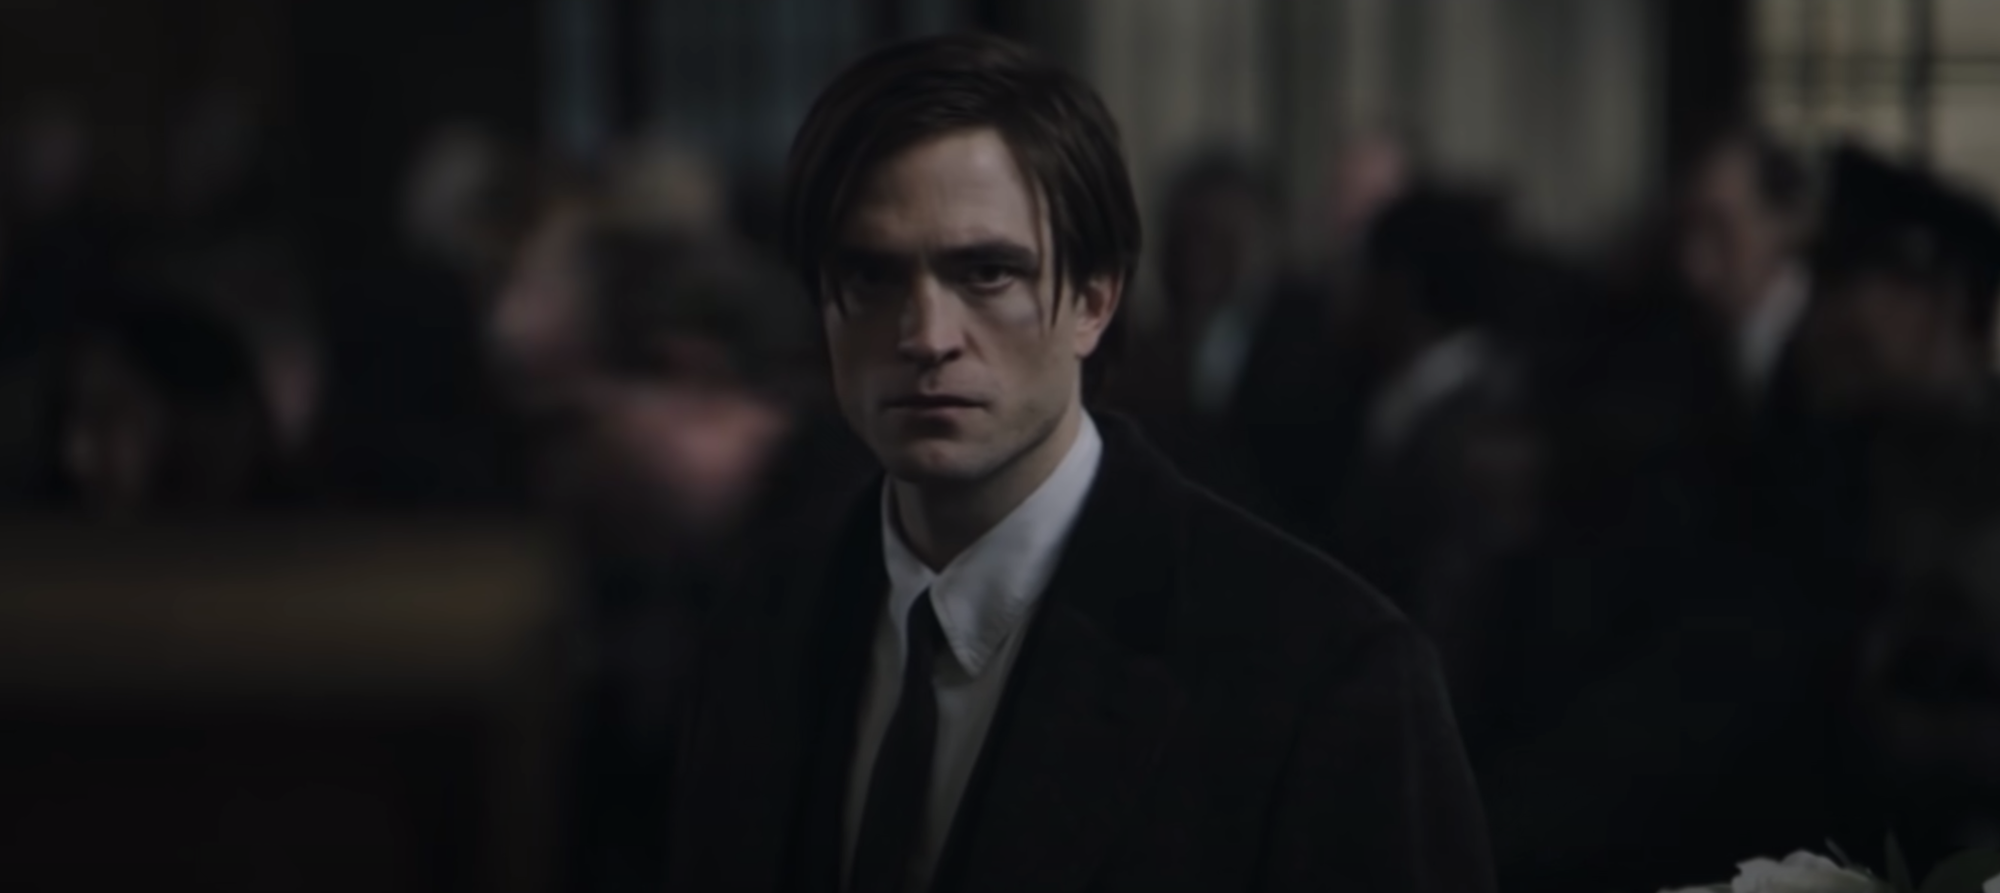 Robert Pattinson as Bruce Wayne in 'The Batman' trailer.